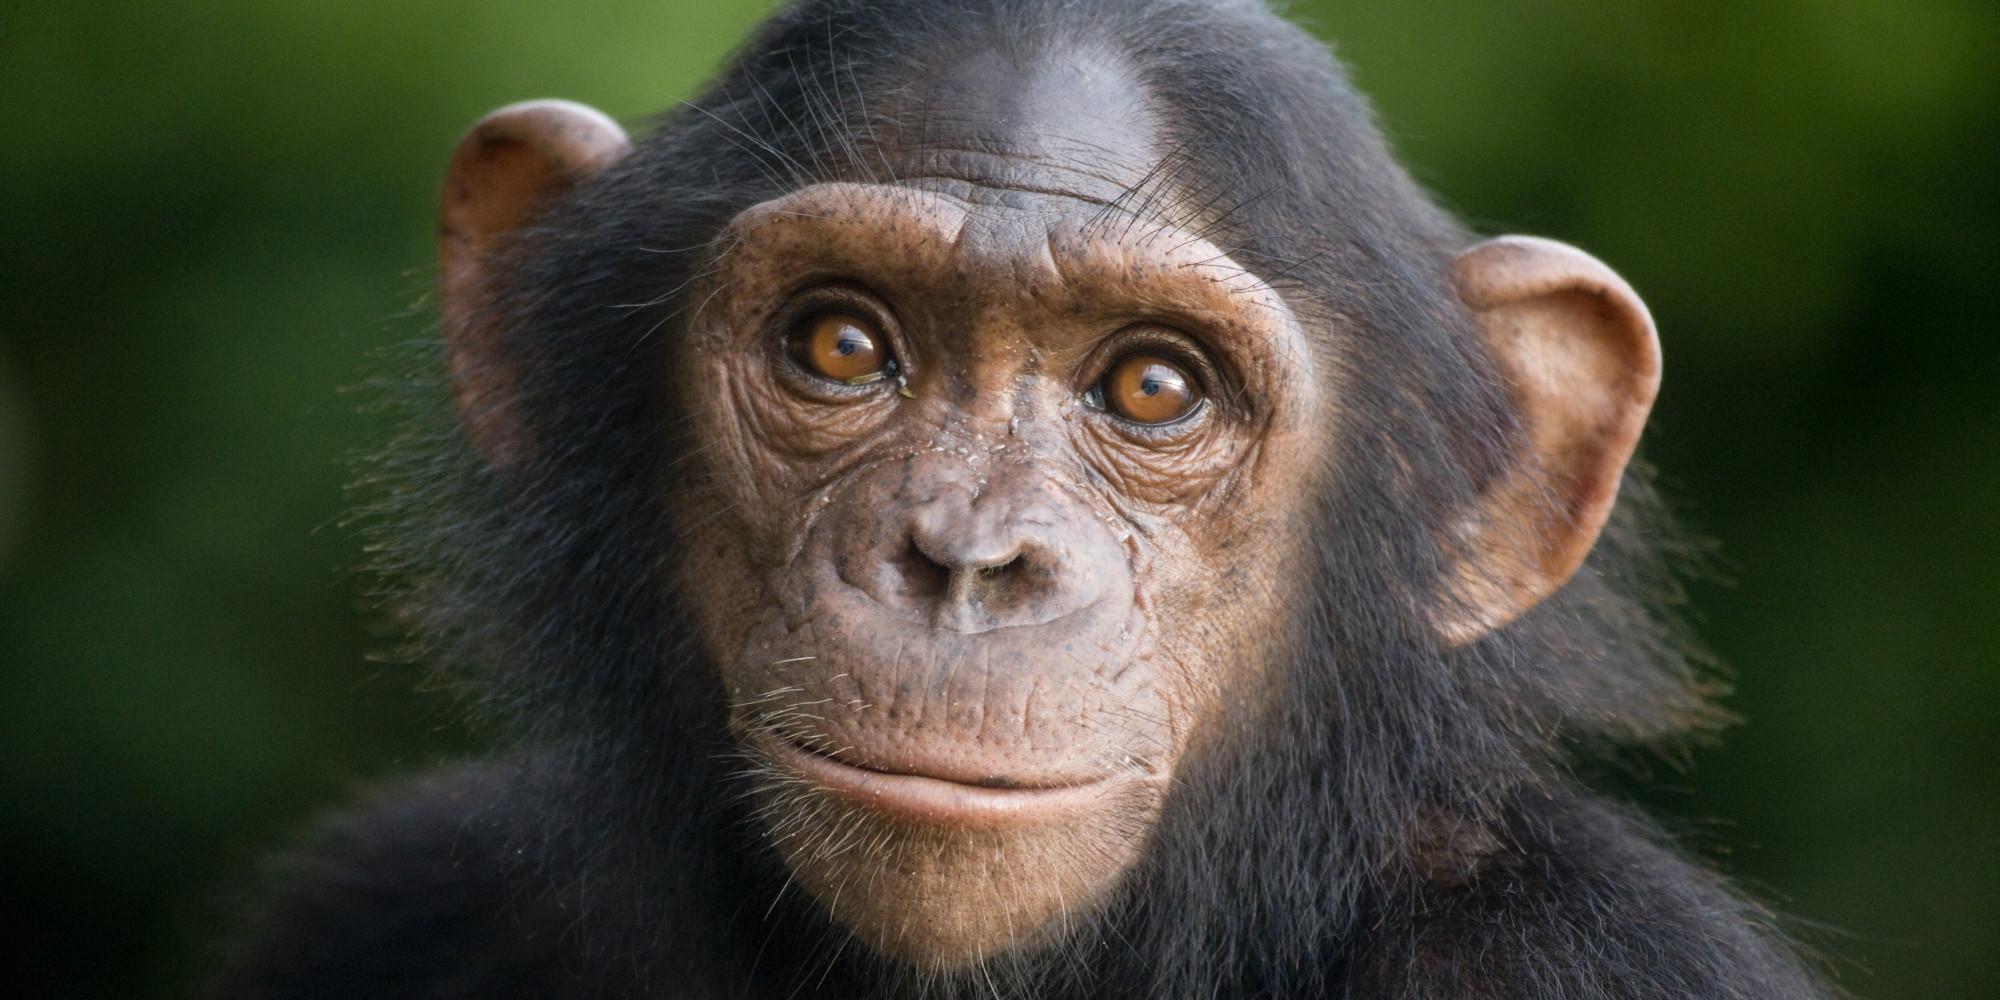 chimpanzee facts history useful information and amazing